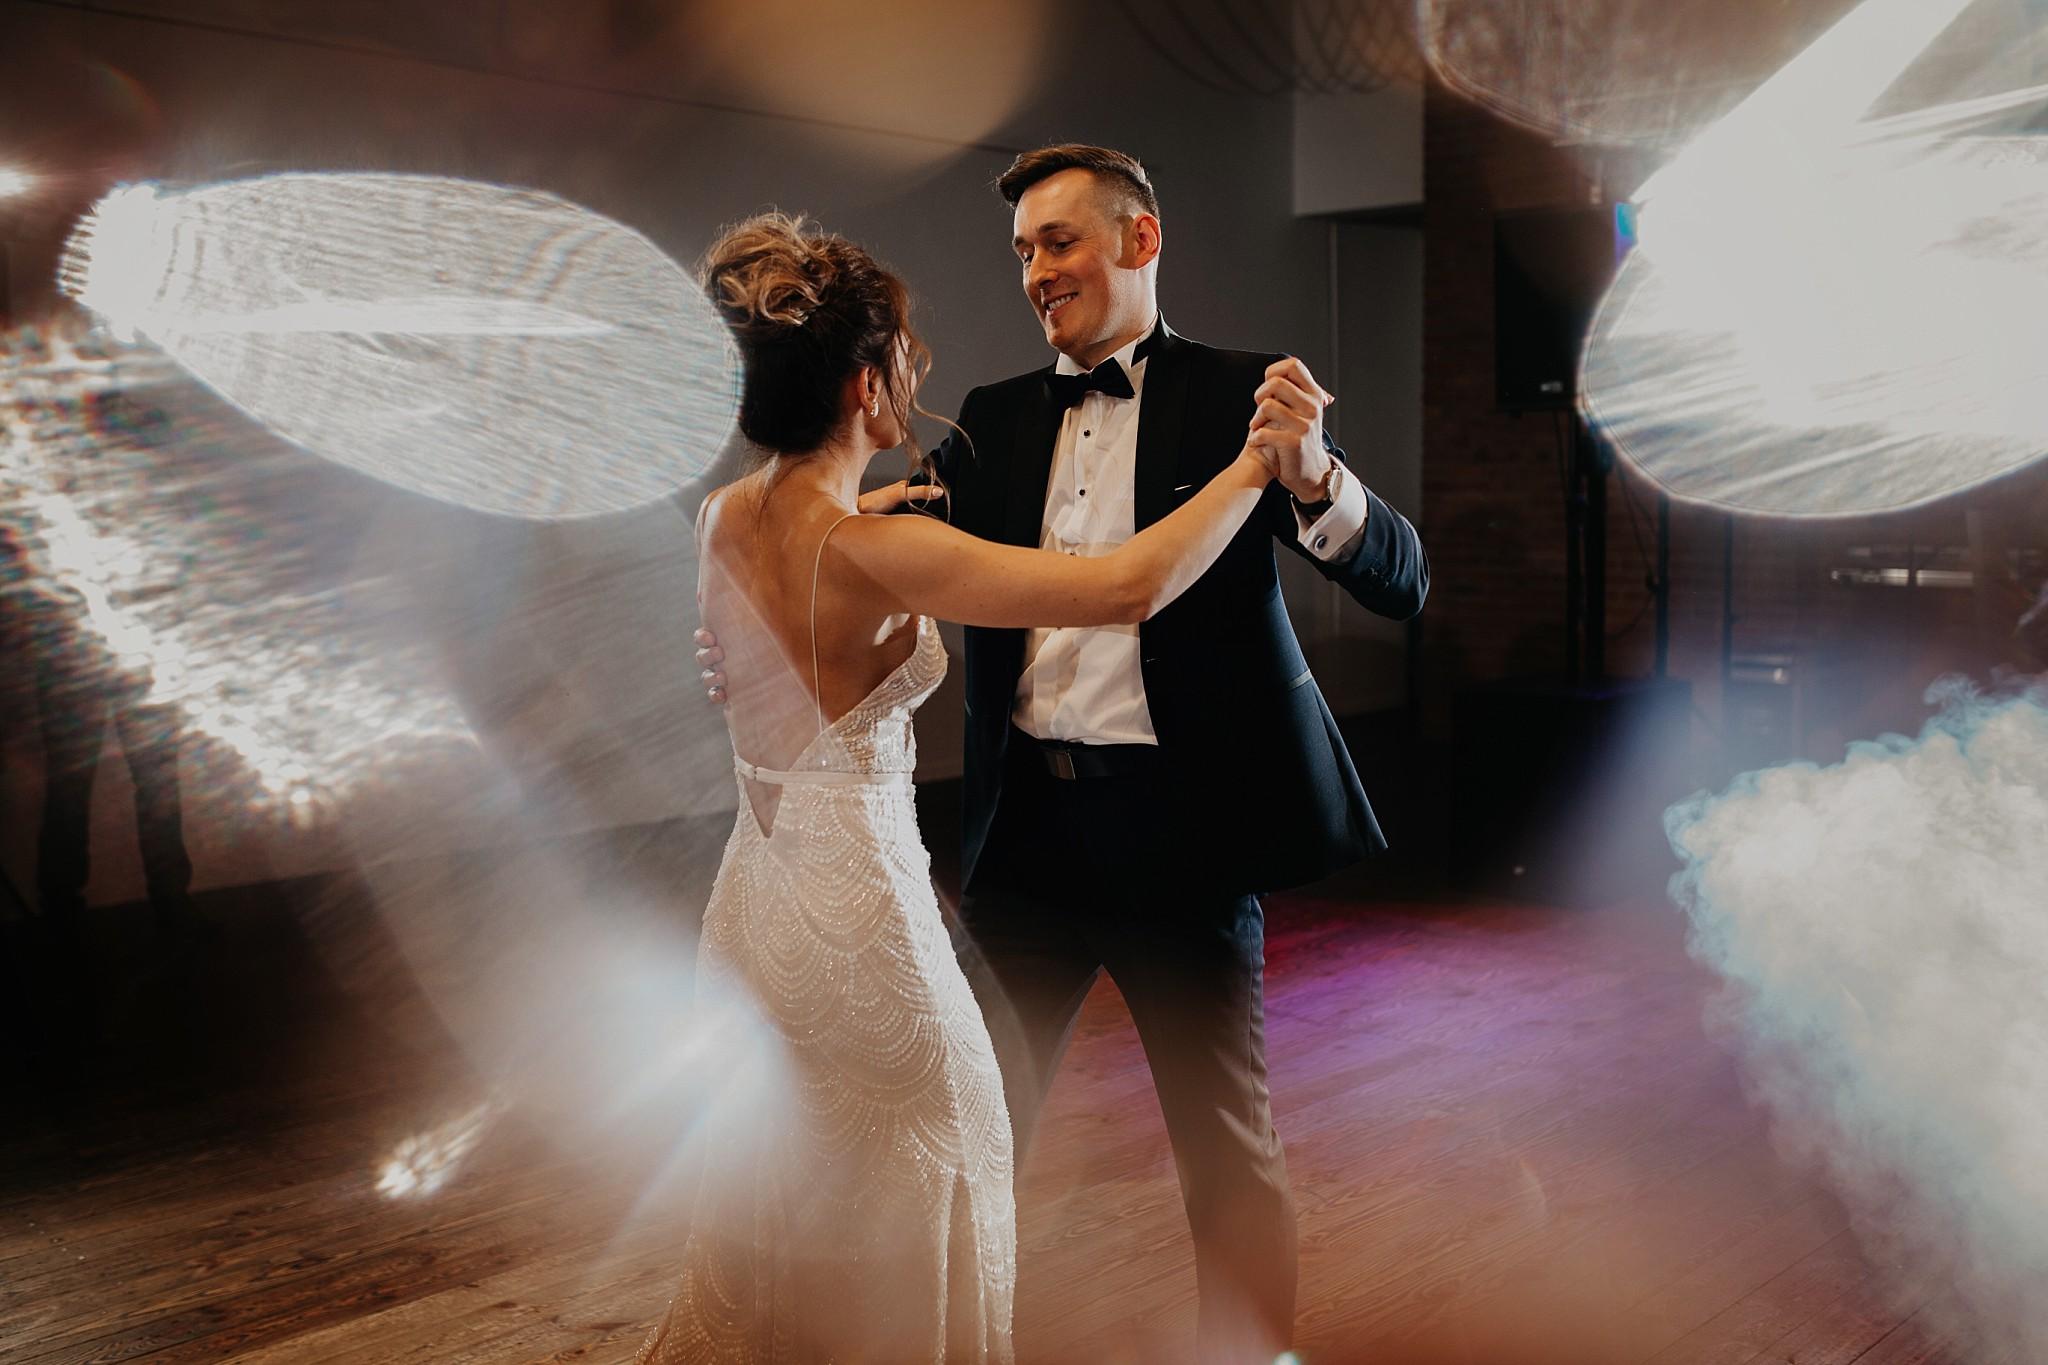 fotograf poznan wesele dobra truskawka piekne wesele pod poznaniem wesele w dobrej truskawce piekna para mloda slub marzen slub koronawirus slub listopad wesele koronawirus 318